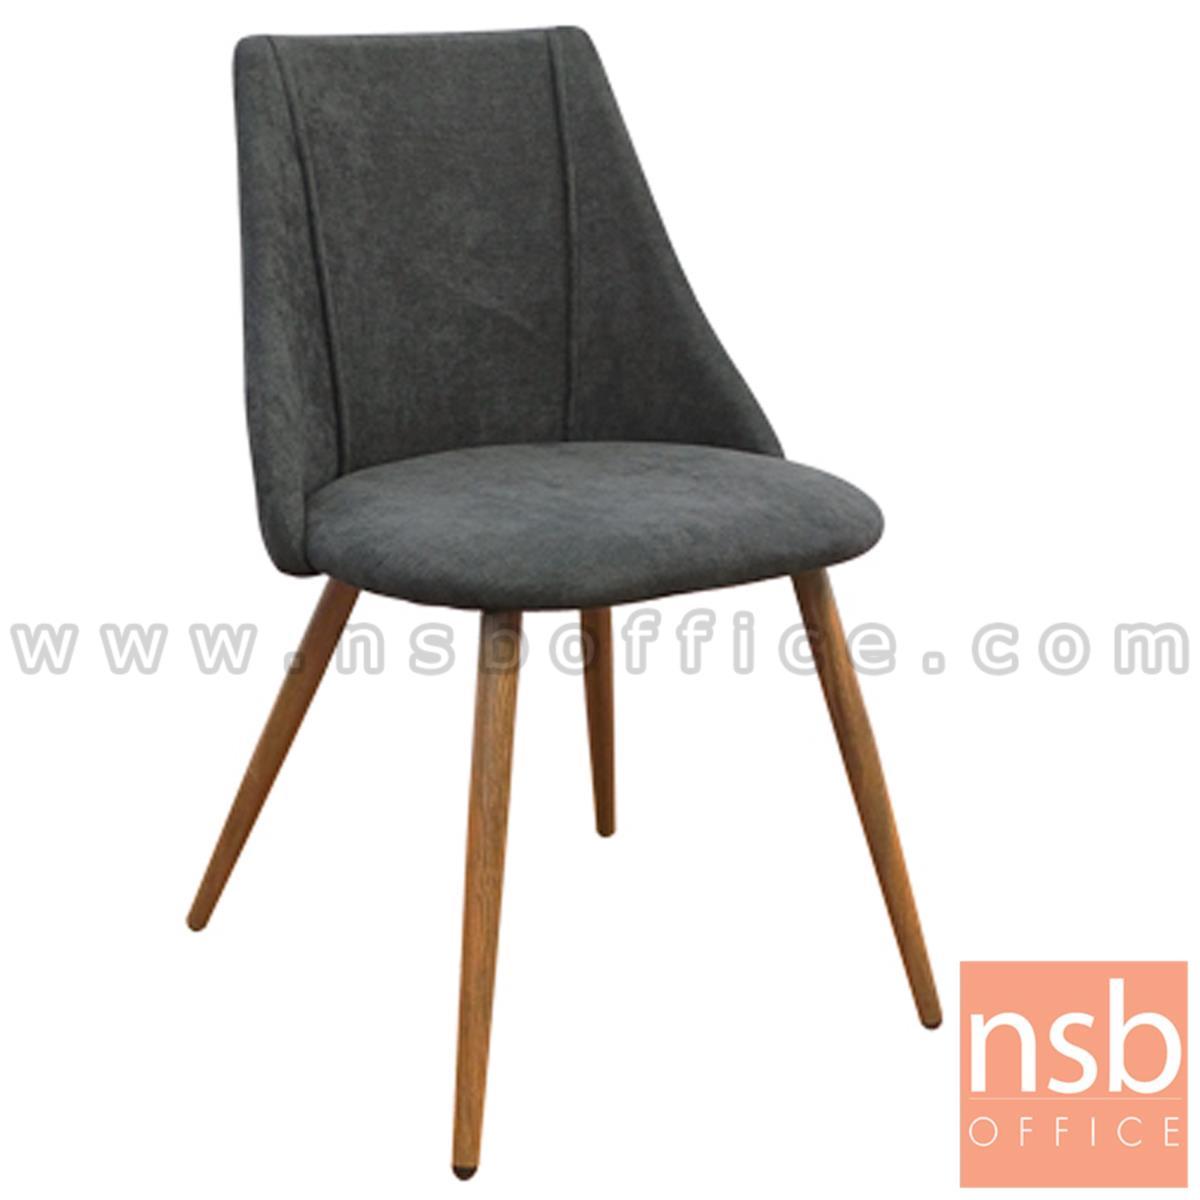 B29A374:เก้าอี้โมเดิร์นหุ้มผ้า รุ่น Florist (ฟลอริสต์) ขาไม้ (1 กล่องบรรจุเก้าอี้ 2 ตัว)